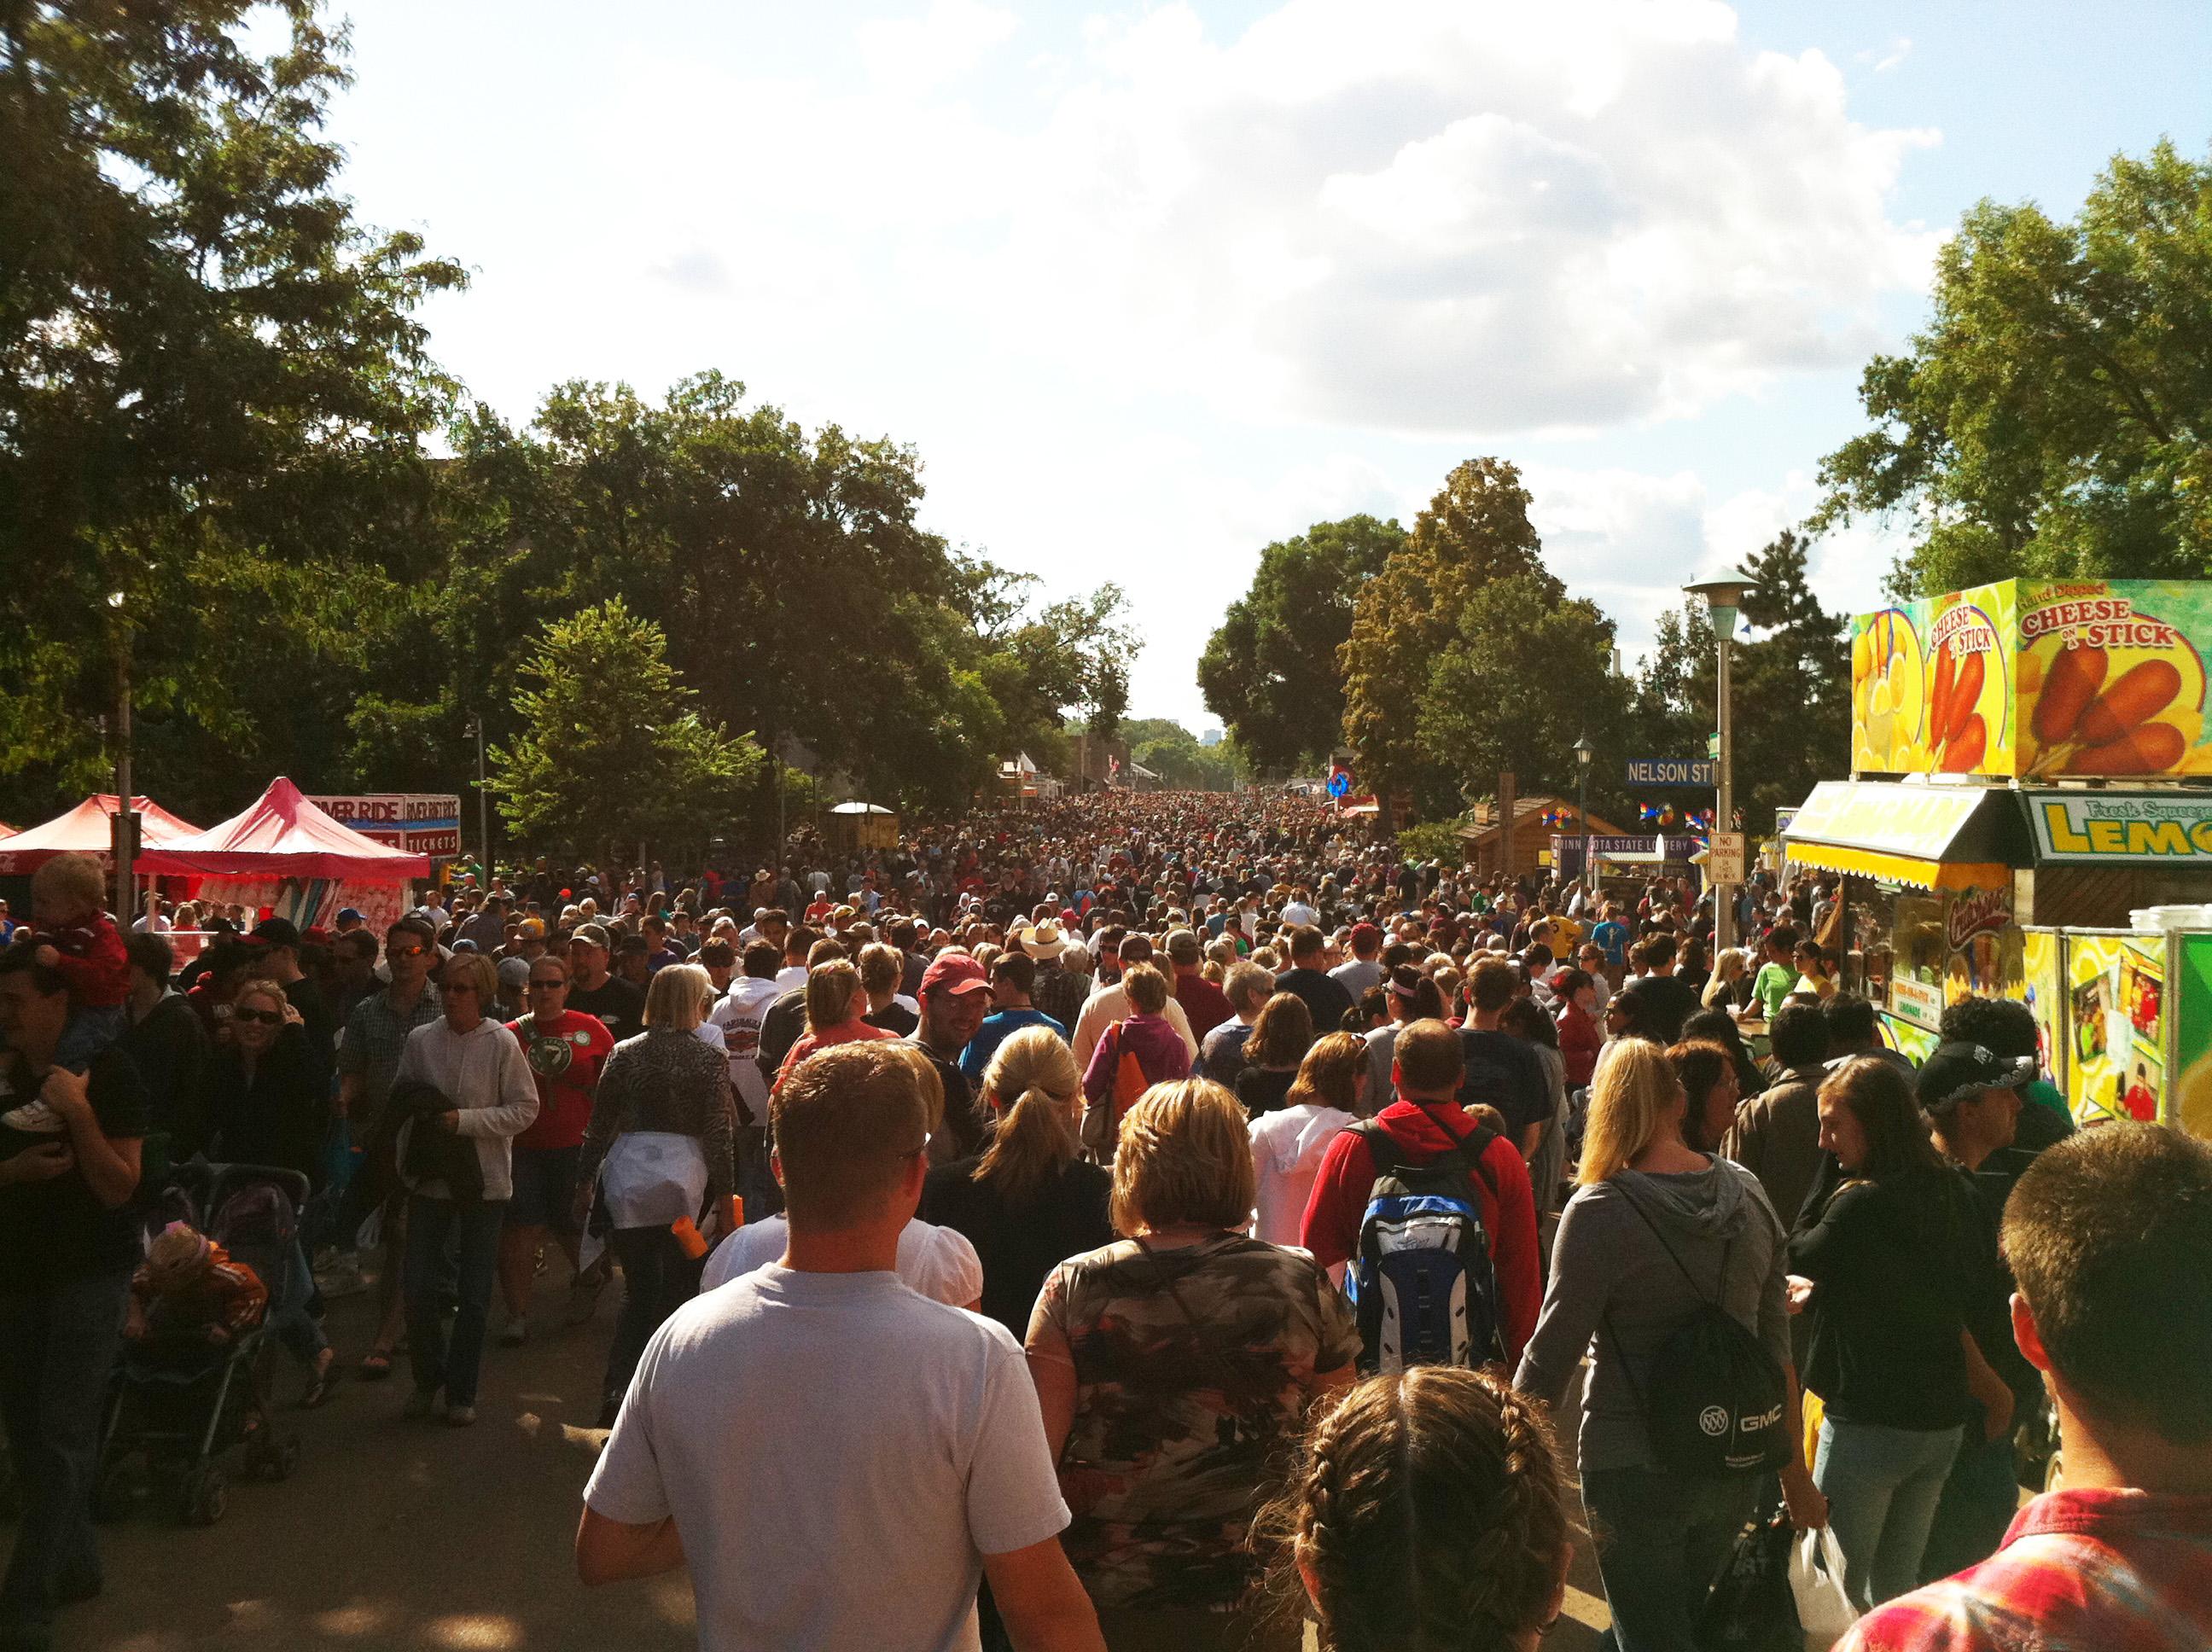 Minnesota State Fair, St. Paul, MN